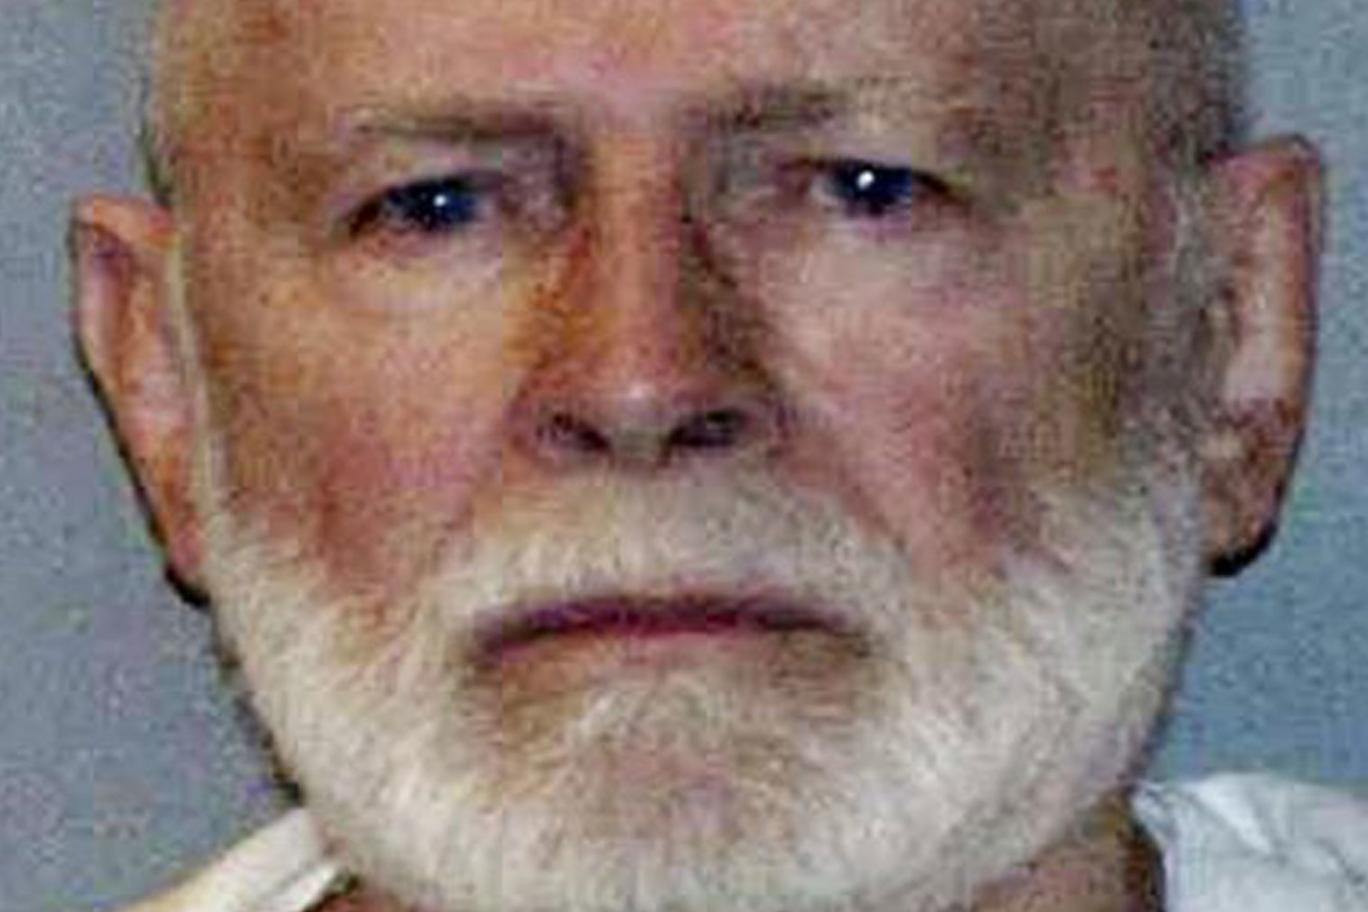 Renowned Boston mobster, Whitey Bulger